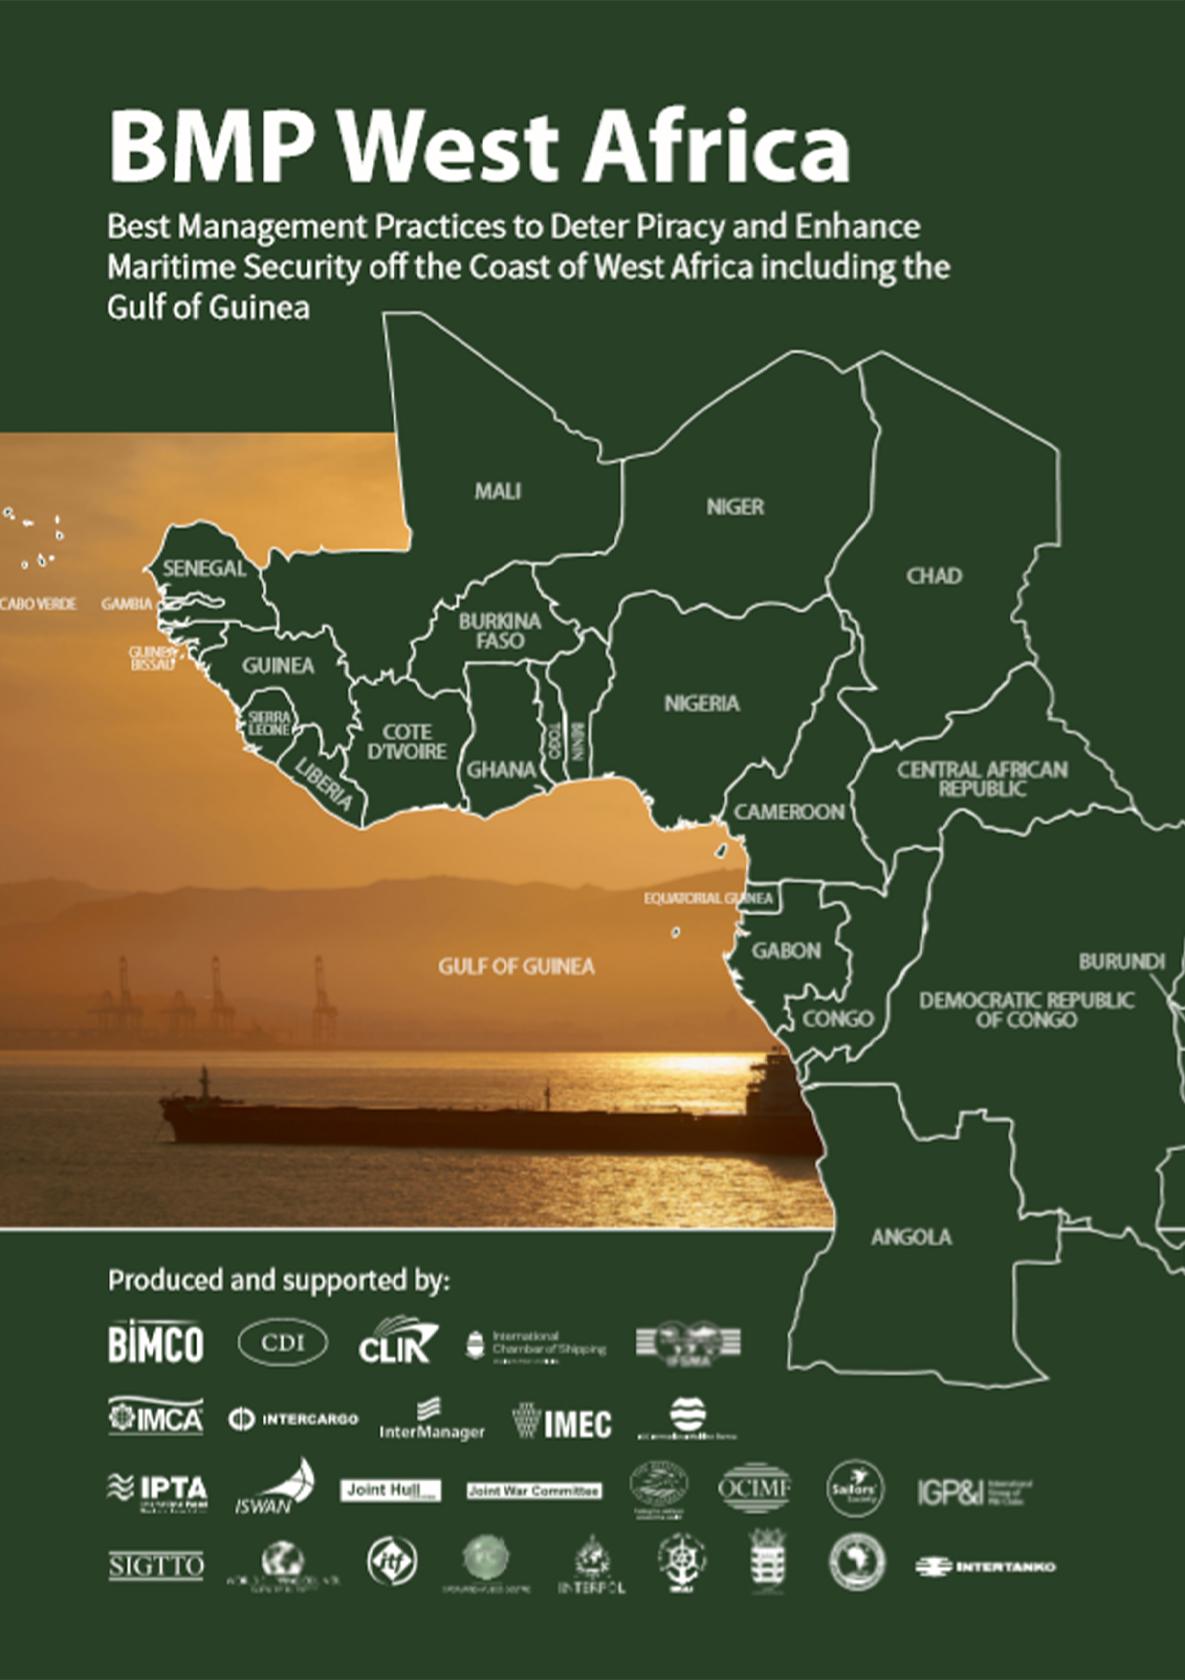 bmp-west-africa.jpg